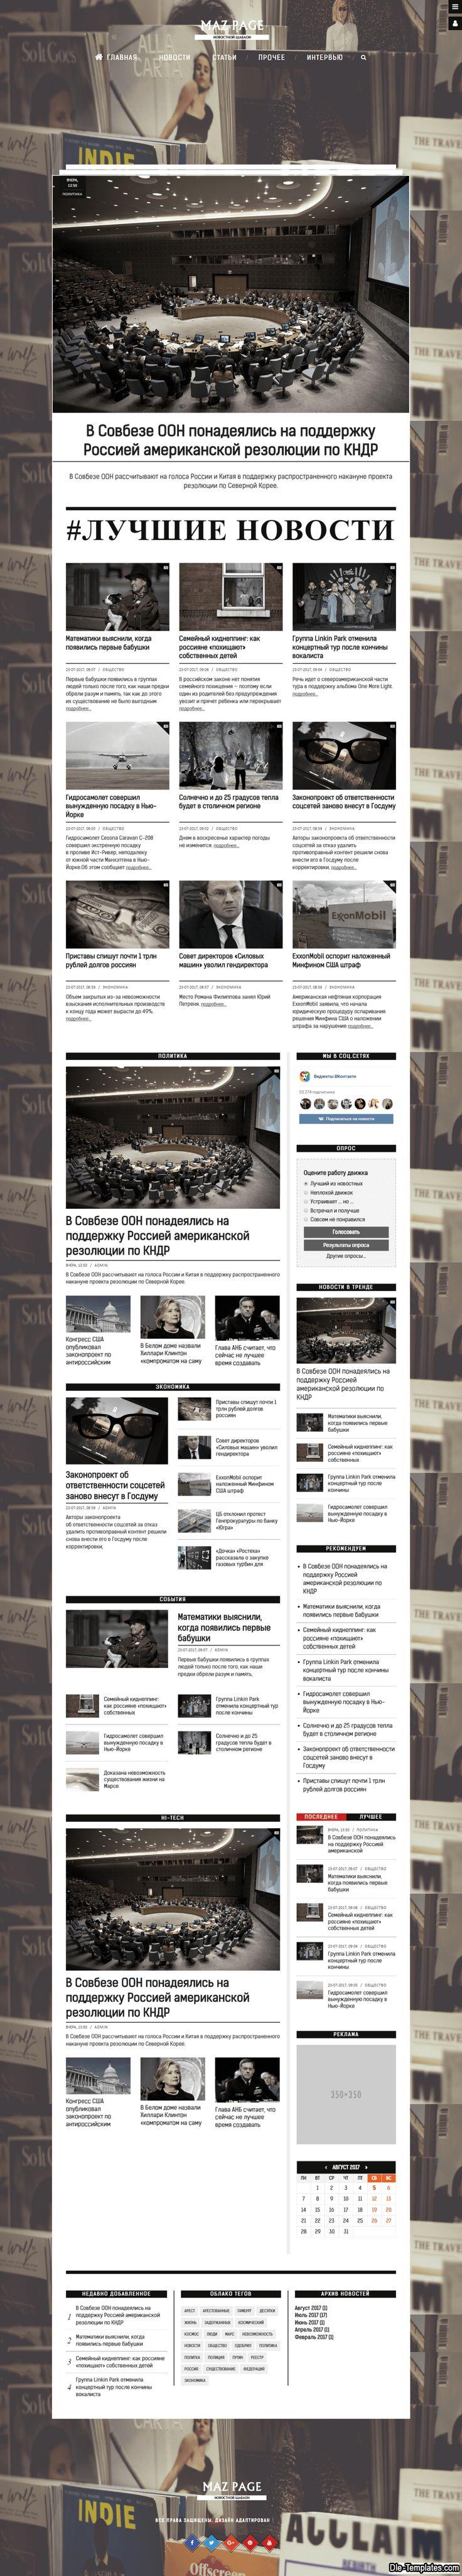 MazPage - новостной шаблон в газетном стиле для DLE #templates #website #шаблон #сайт #web DataLife Engine (DLE)